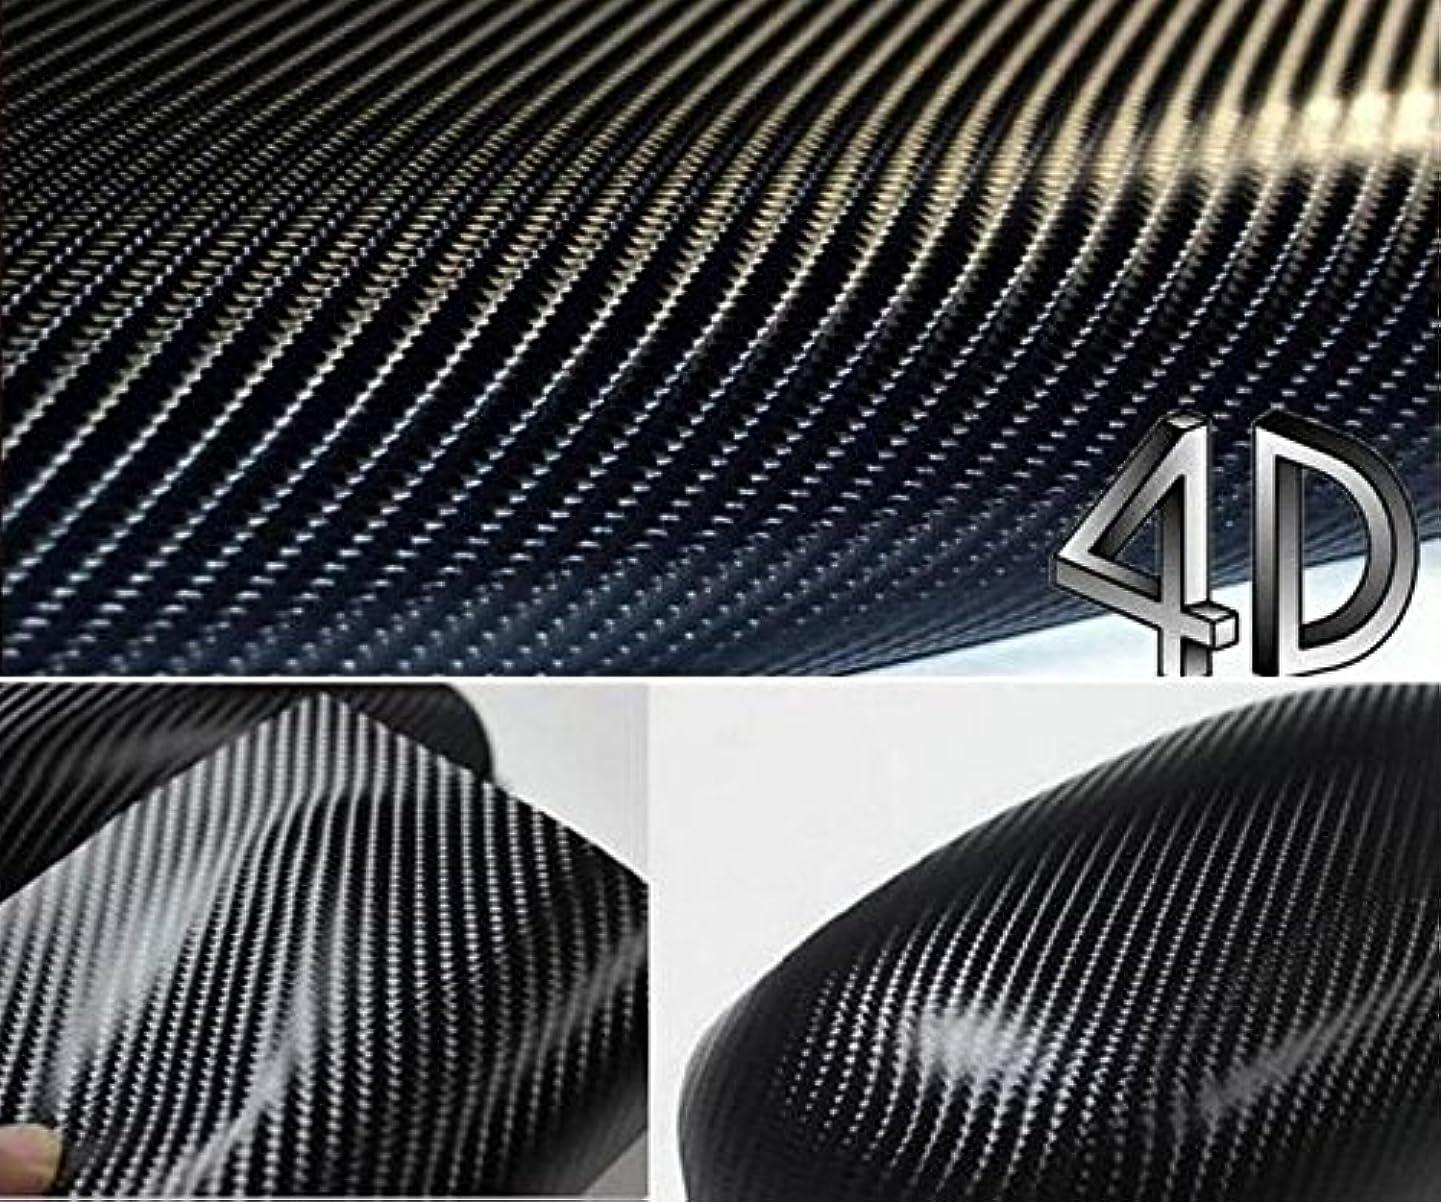 DIYAH 4D Black Carbon Fiber Vinyl Wrap Sticker with Air Realease Bubble Free anti-wrinkle 12